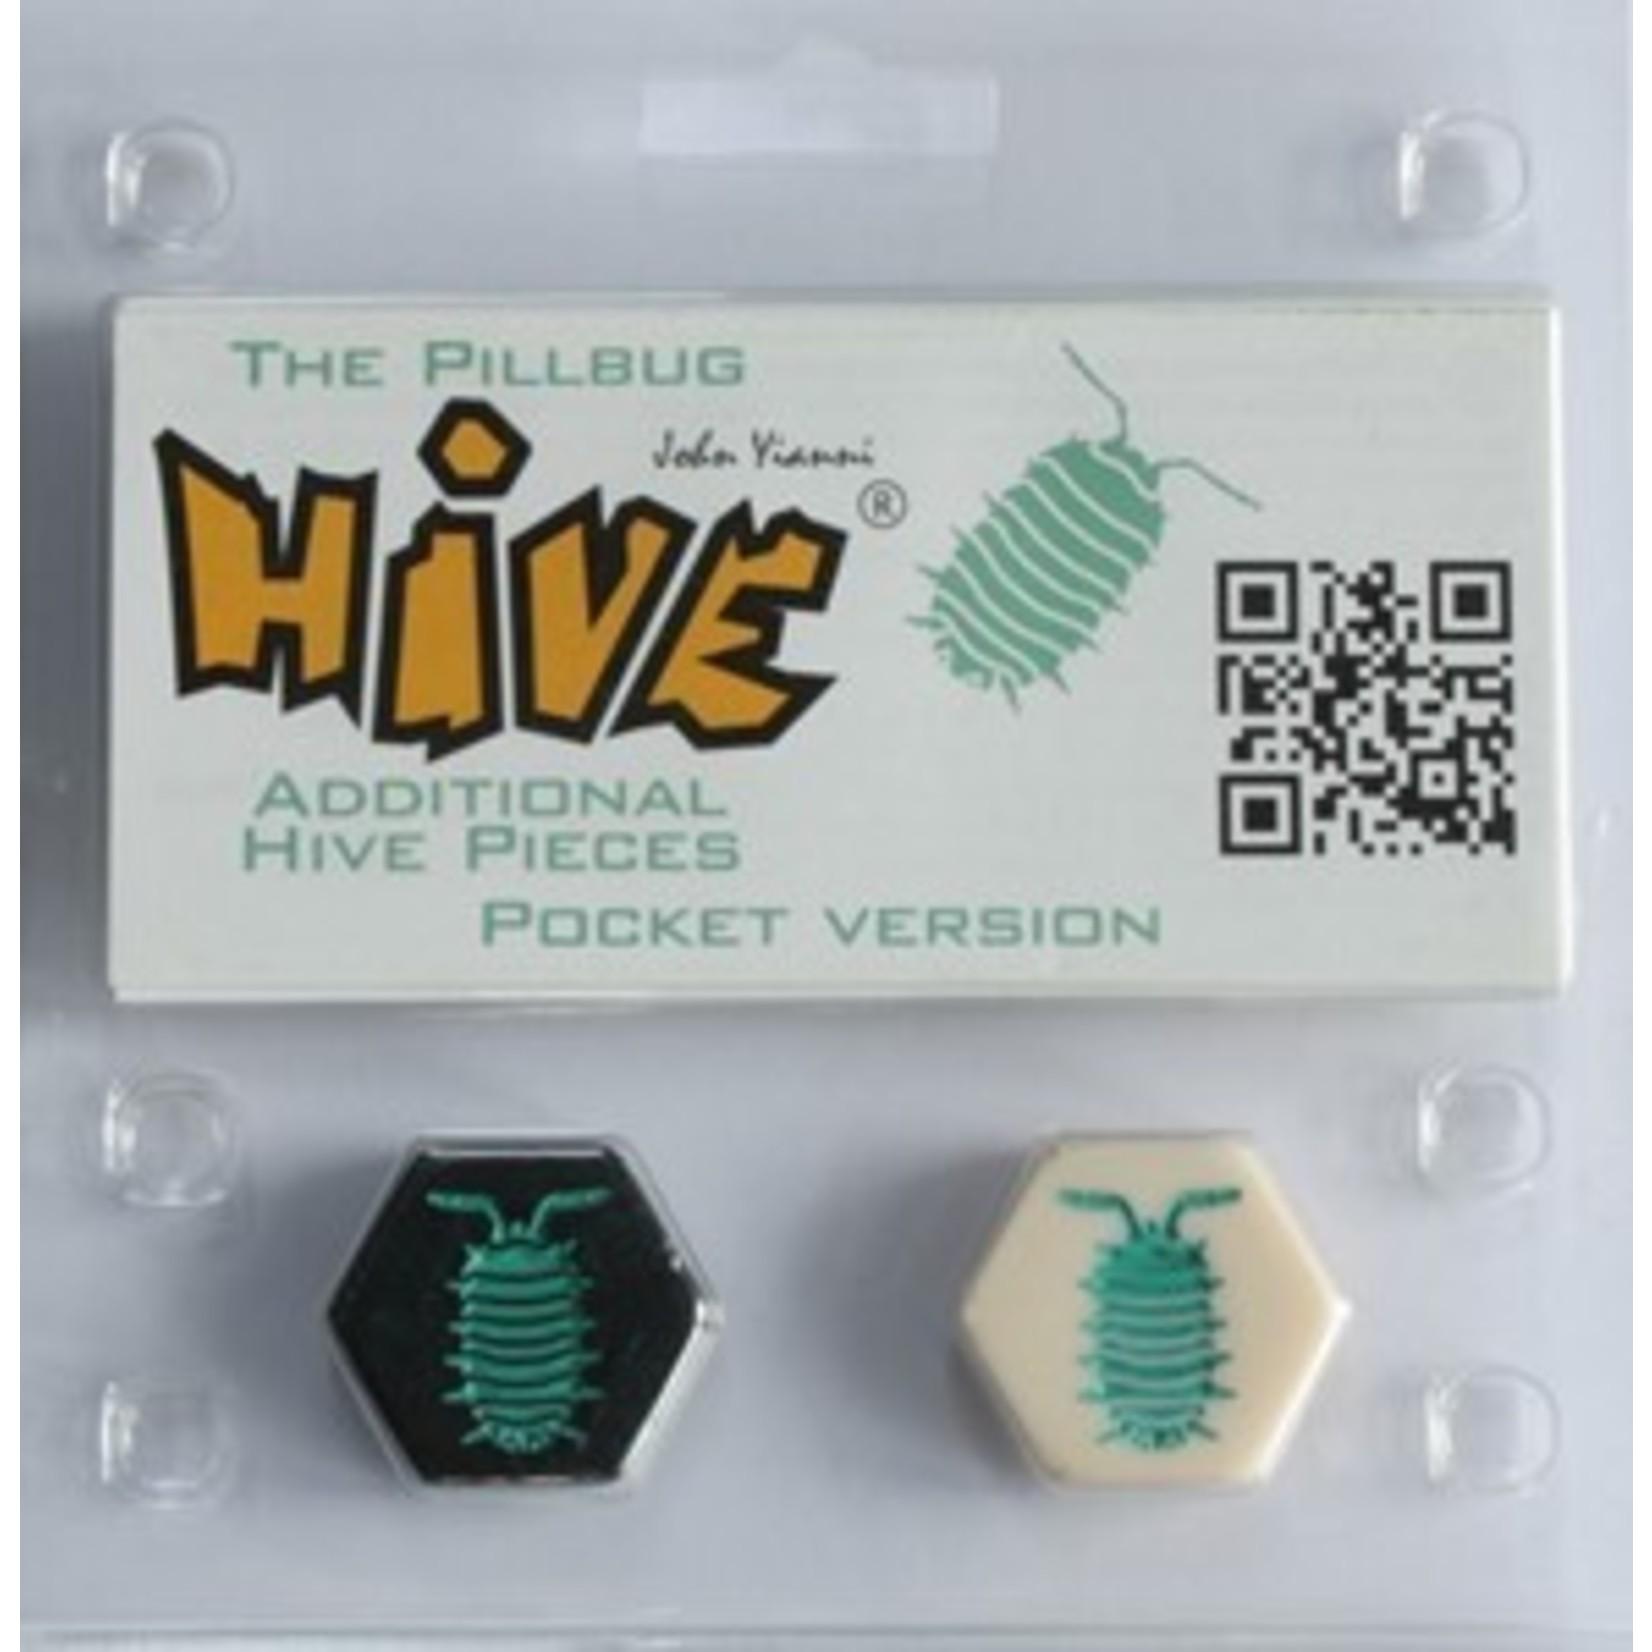 Hive: Pillbug Pocket Expansion